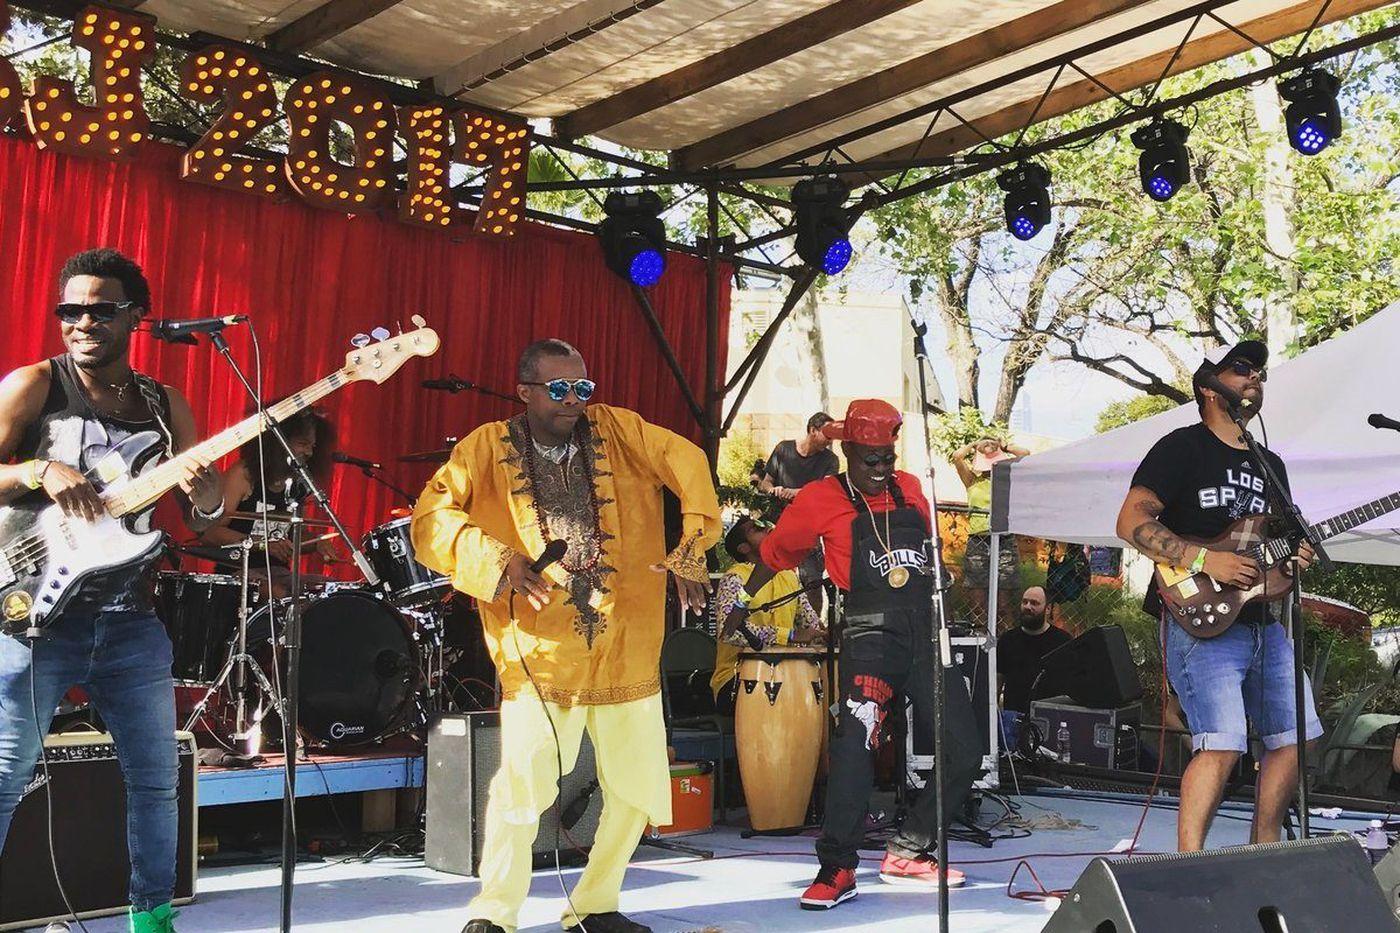 Dan DeLuca's Mix Picks: Tribu Baharu at Nuevofest, Ghost and Dawn Richard